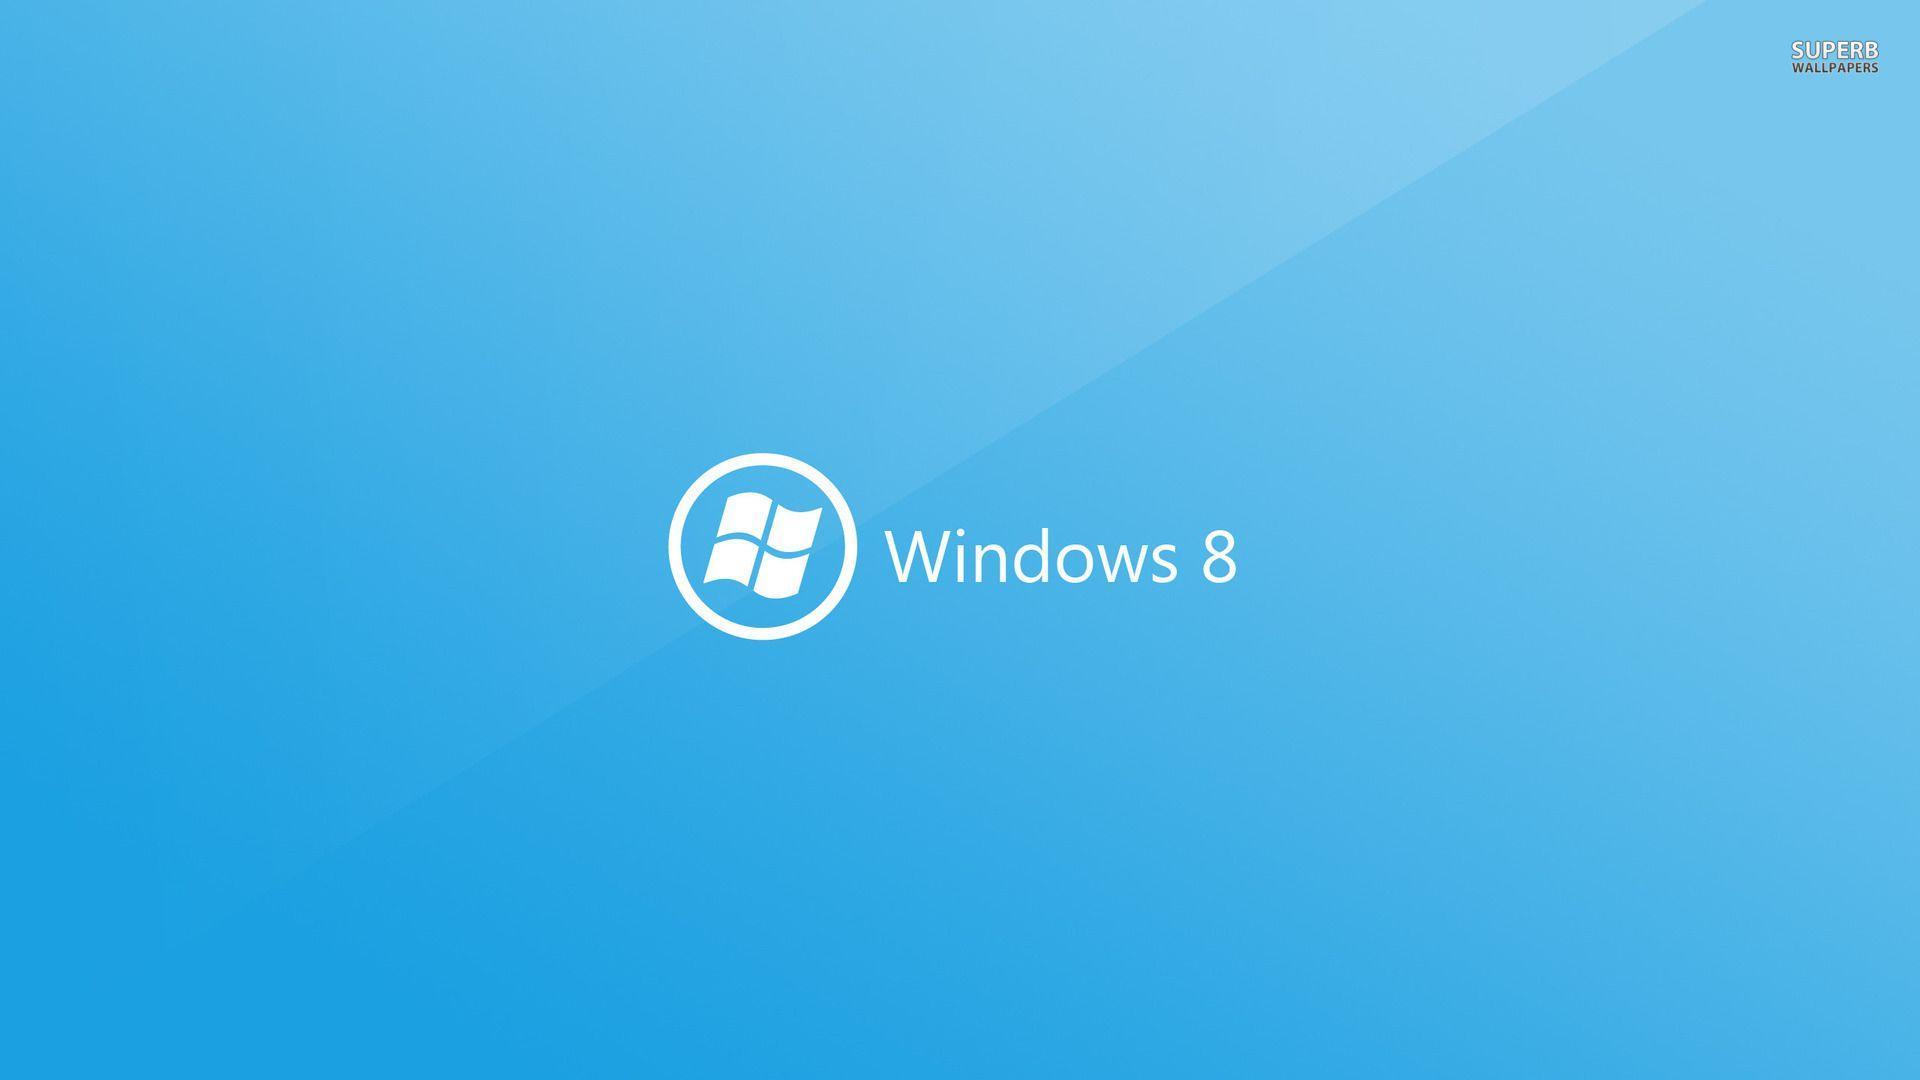 windows 8 de fond - photo #27